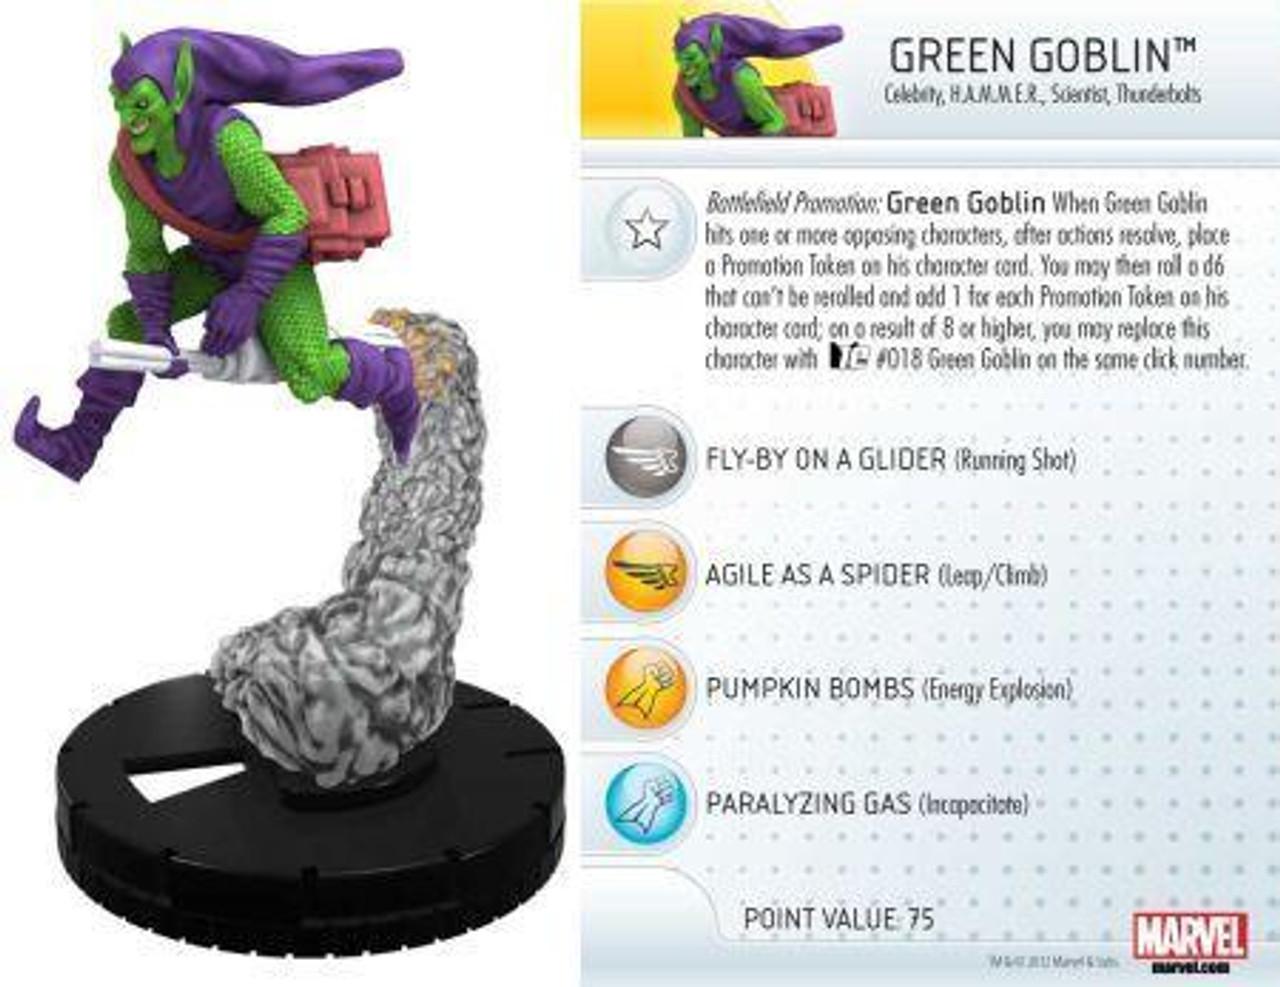 Marvel 10th Anniversary HeroClix Green Goblin #004